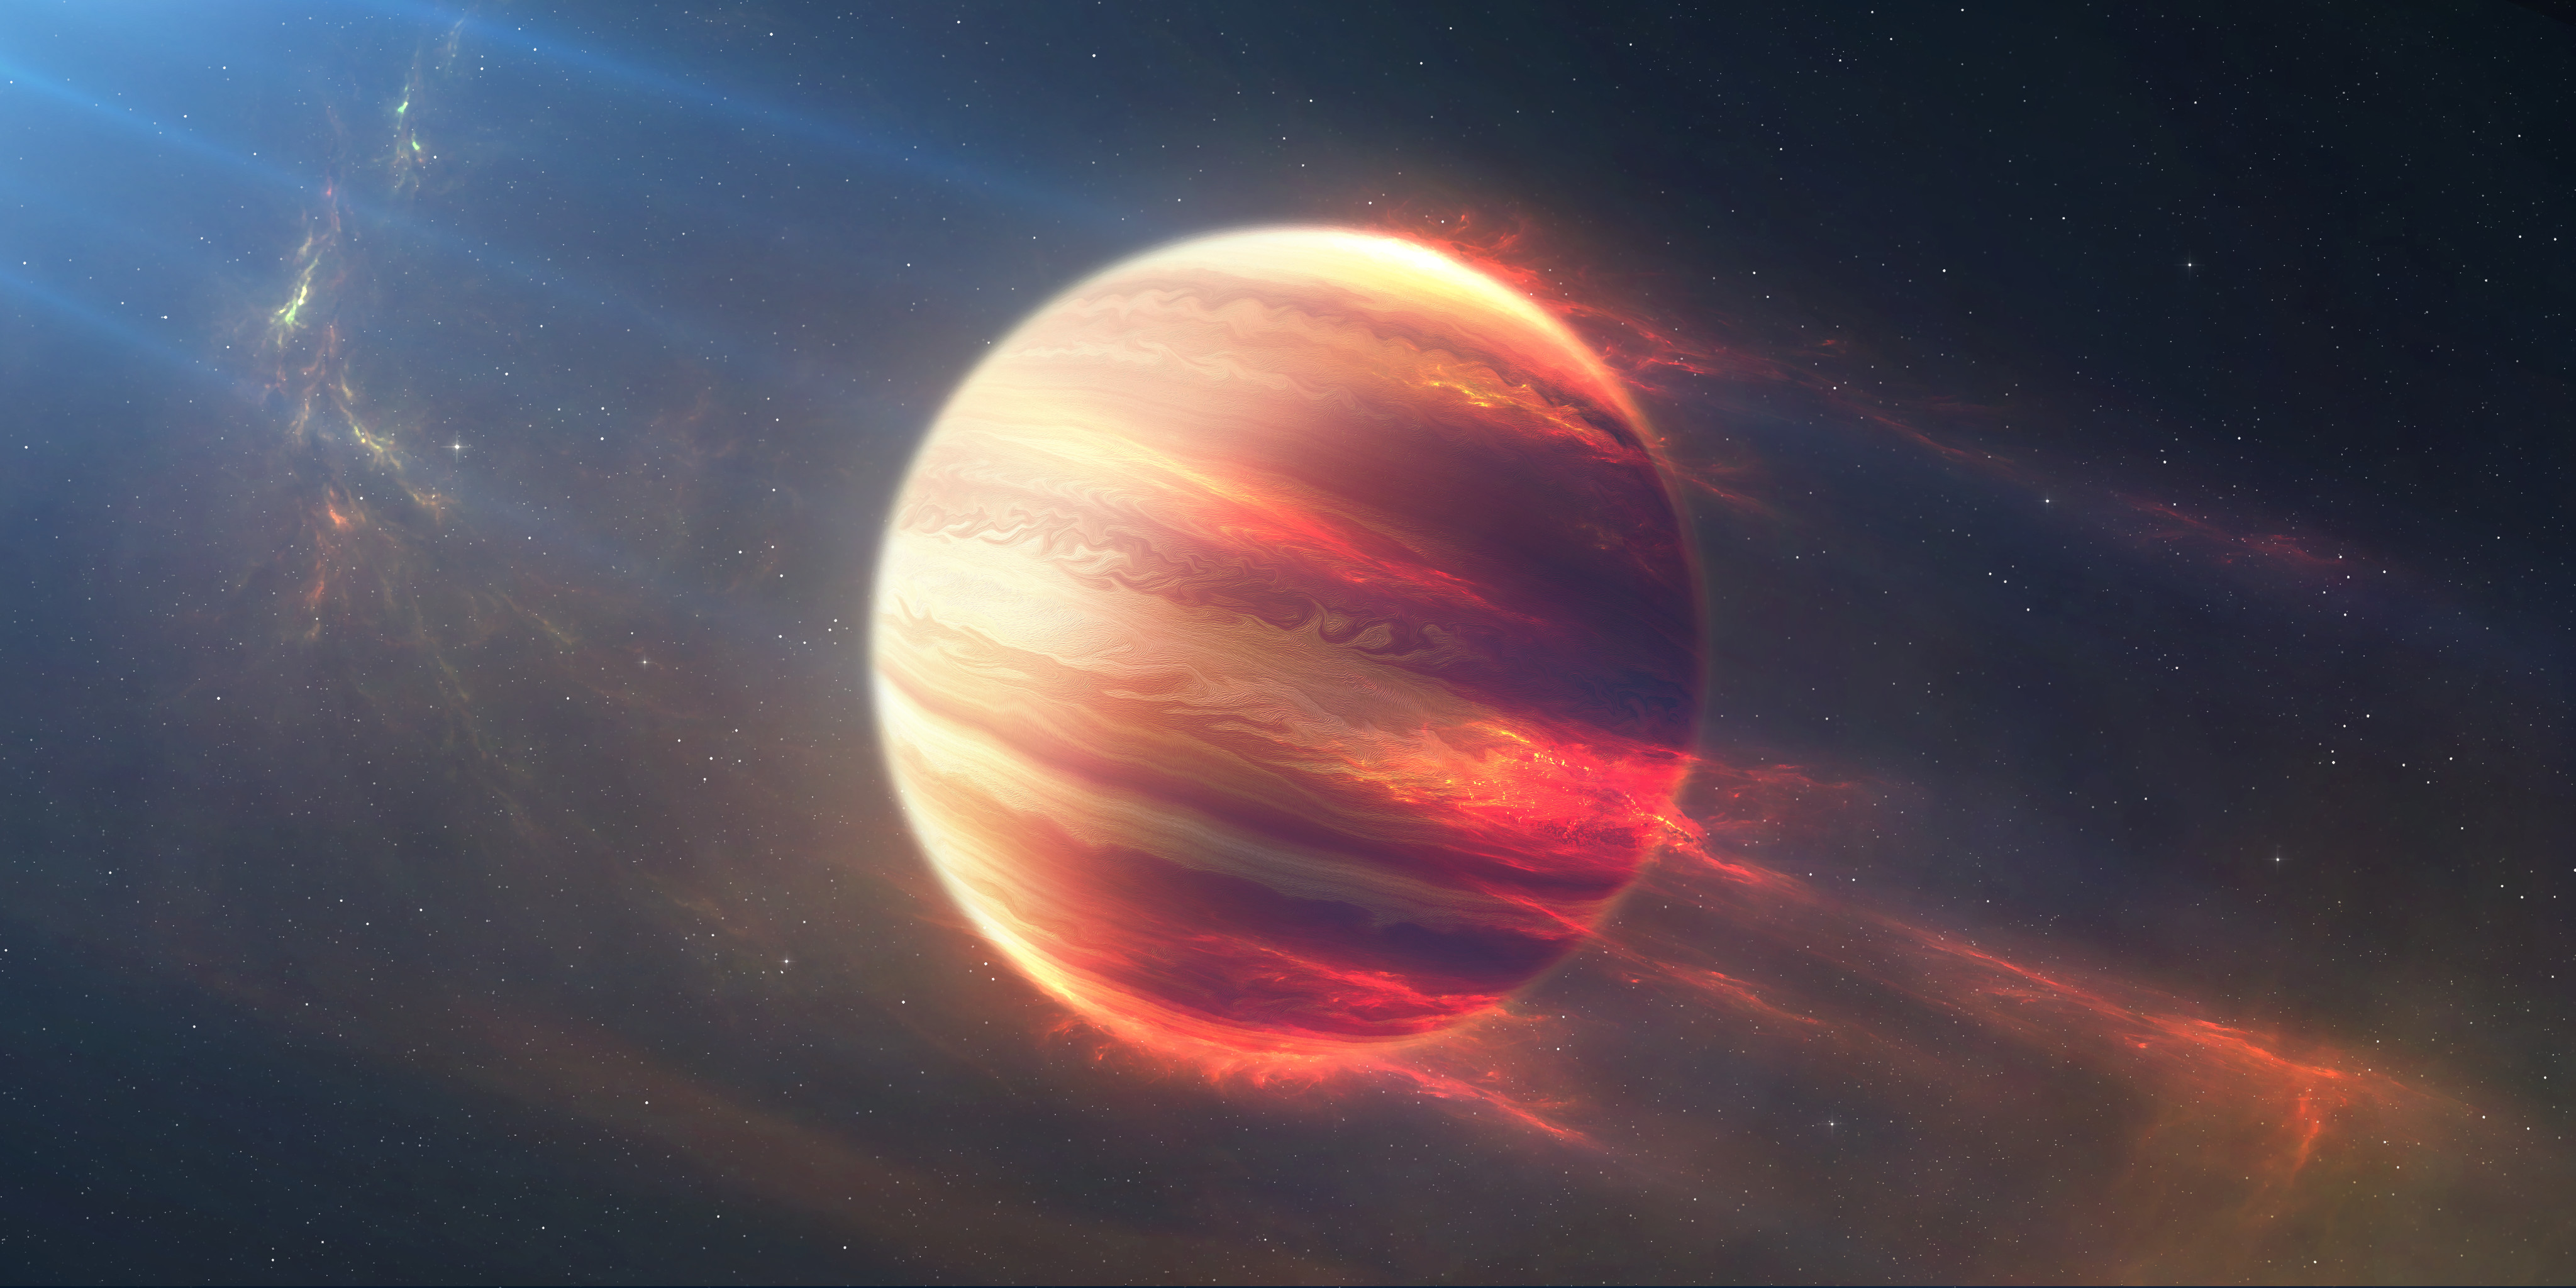 General 4096x2048 planet space Jupiter stars digital art space art